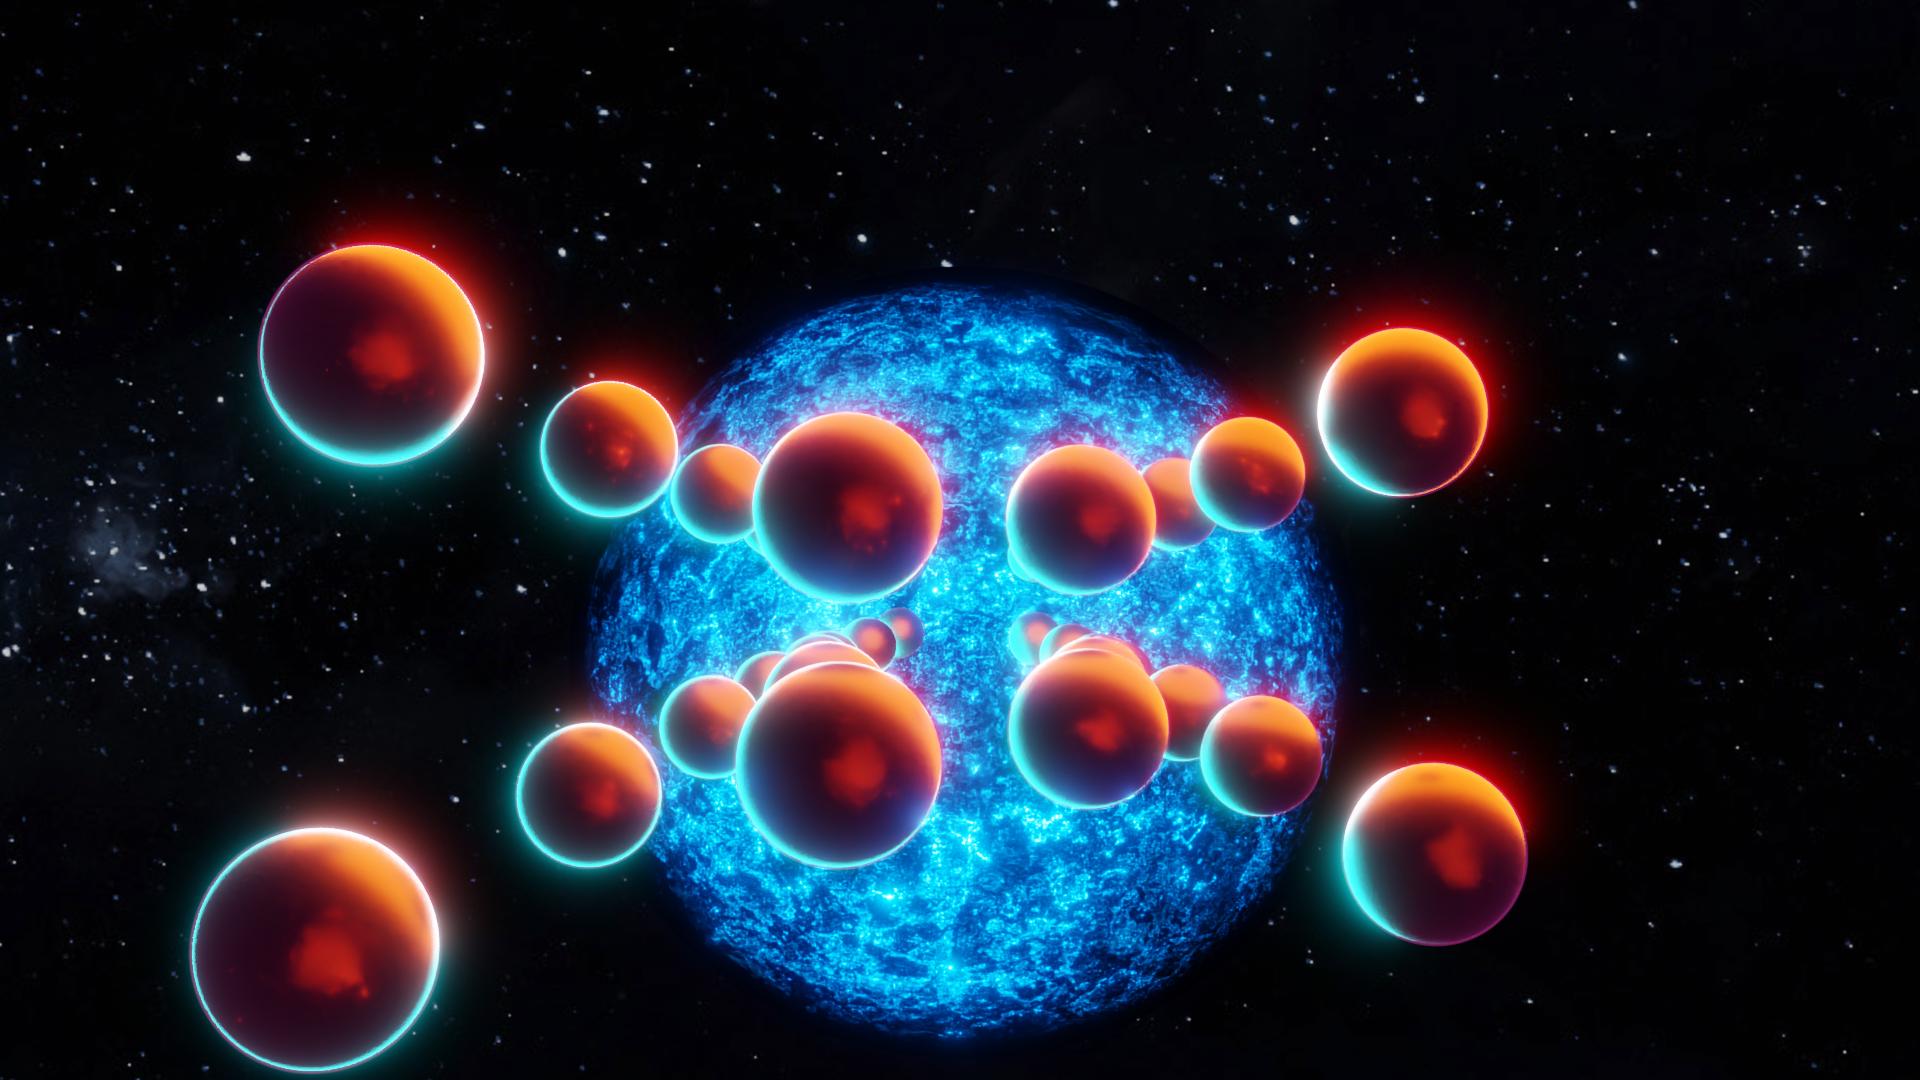 General 1920x1080 Pendulum abstract 3D Abstract space Sun stars balls red sun Blender graphic design 3D graphics